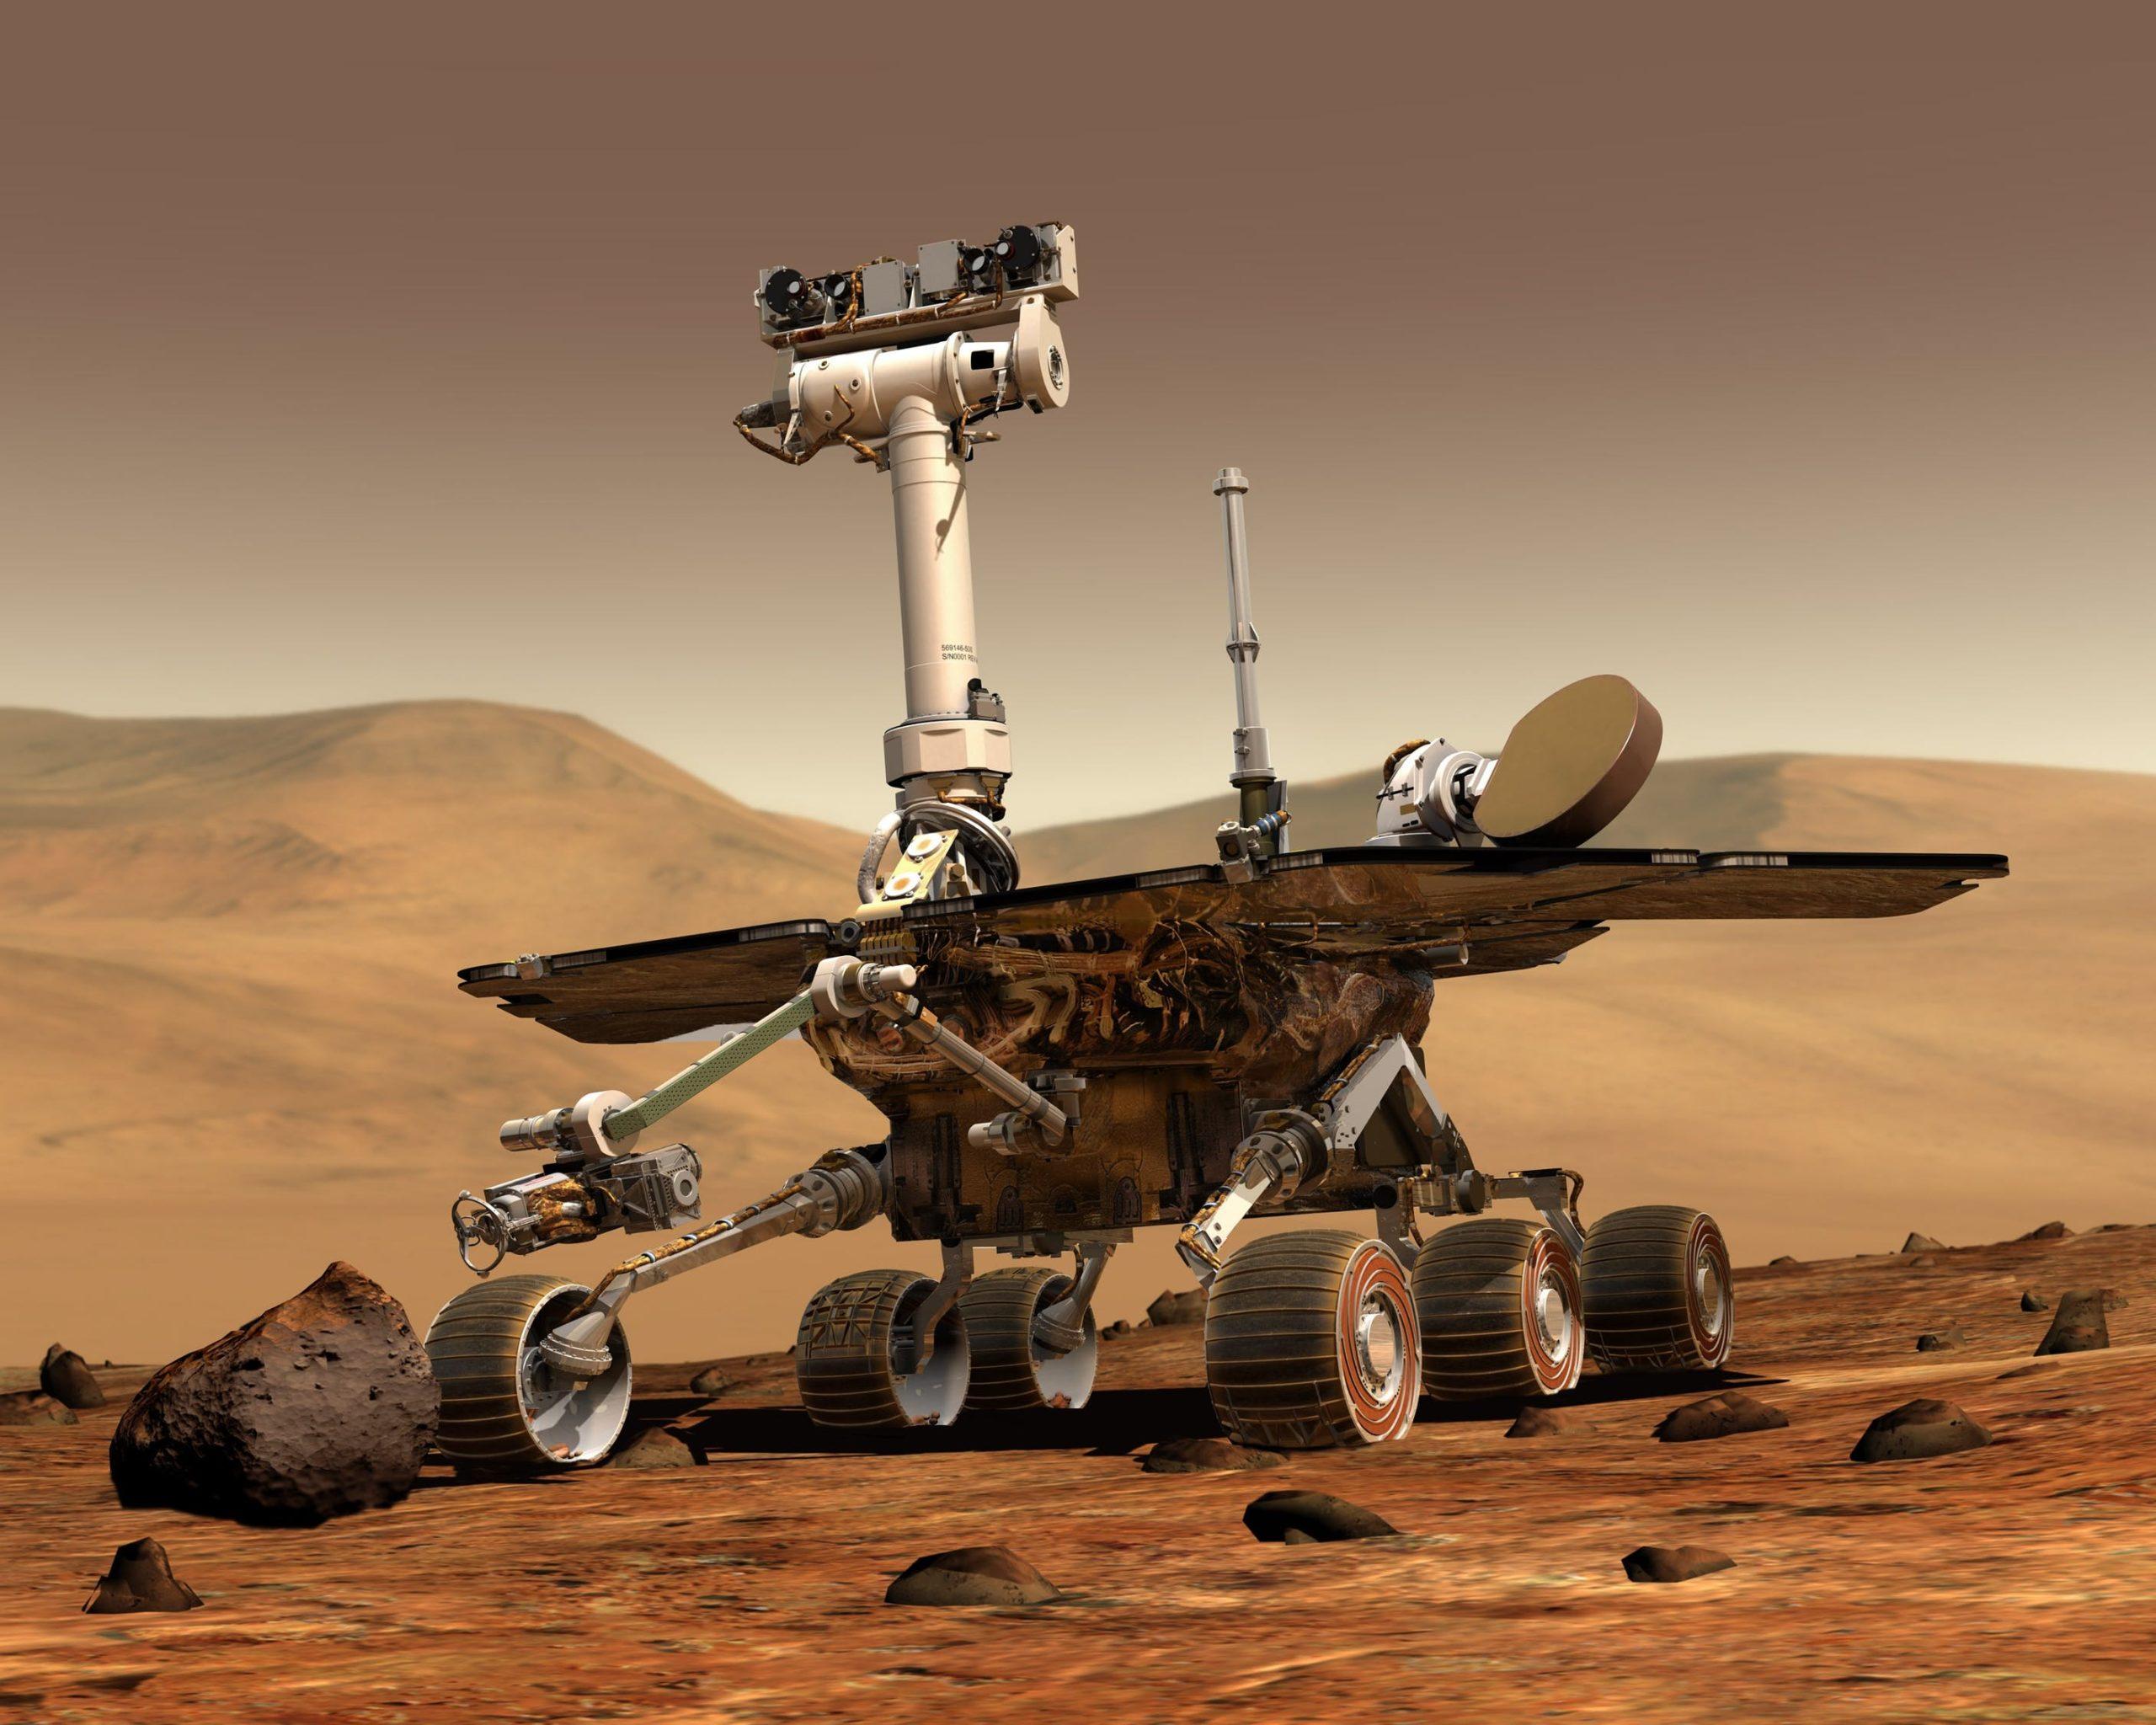 Mars invasion mission